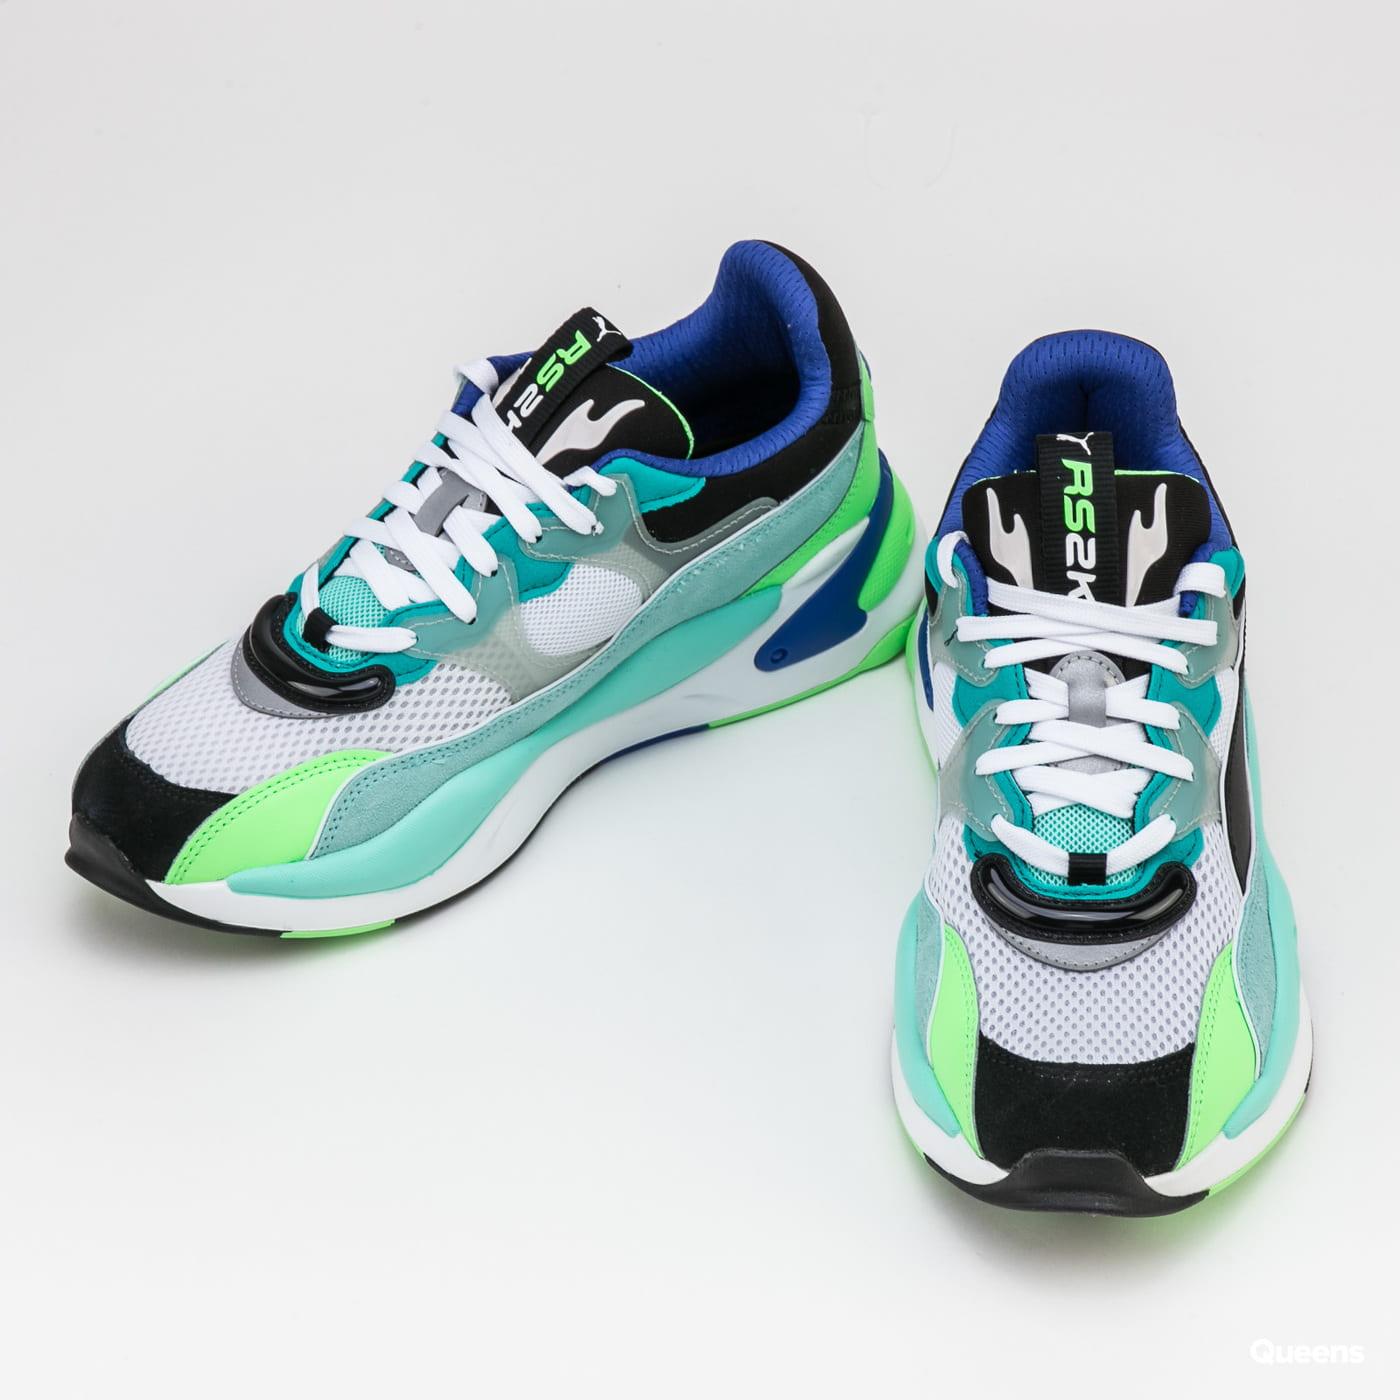 Sneakers Puma RS - 2K Internet